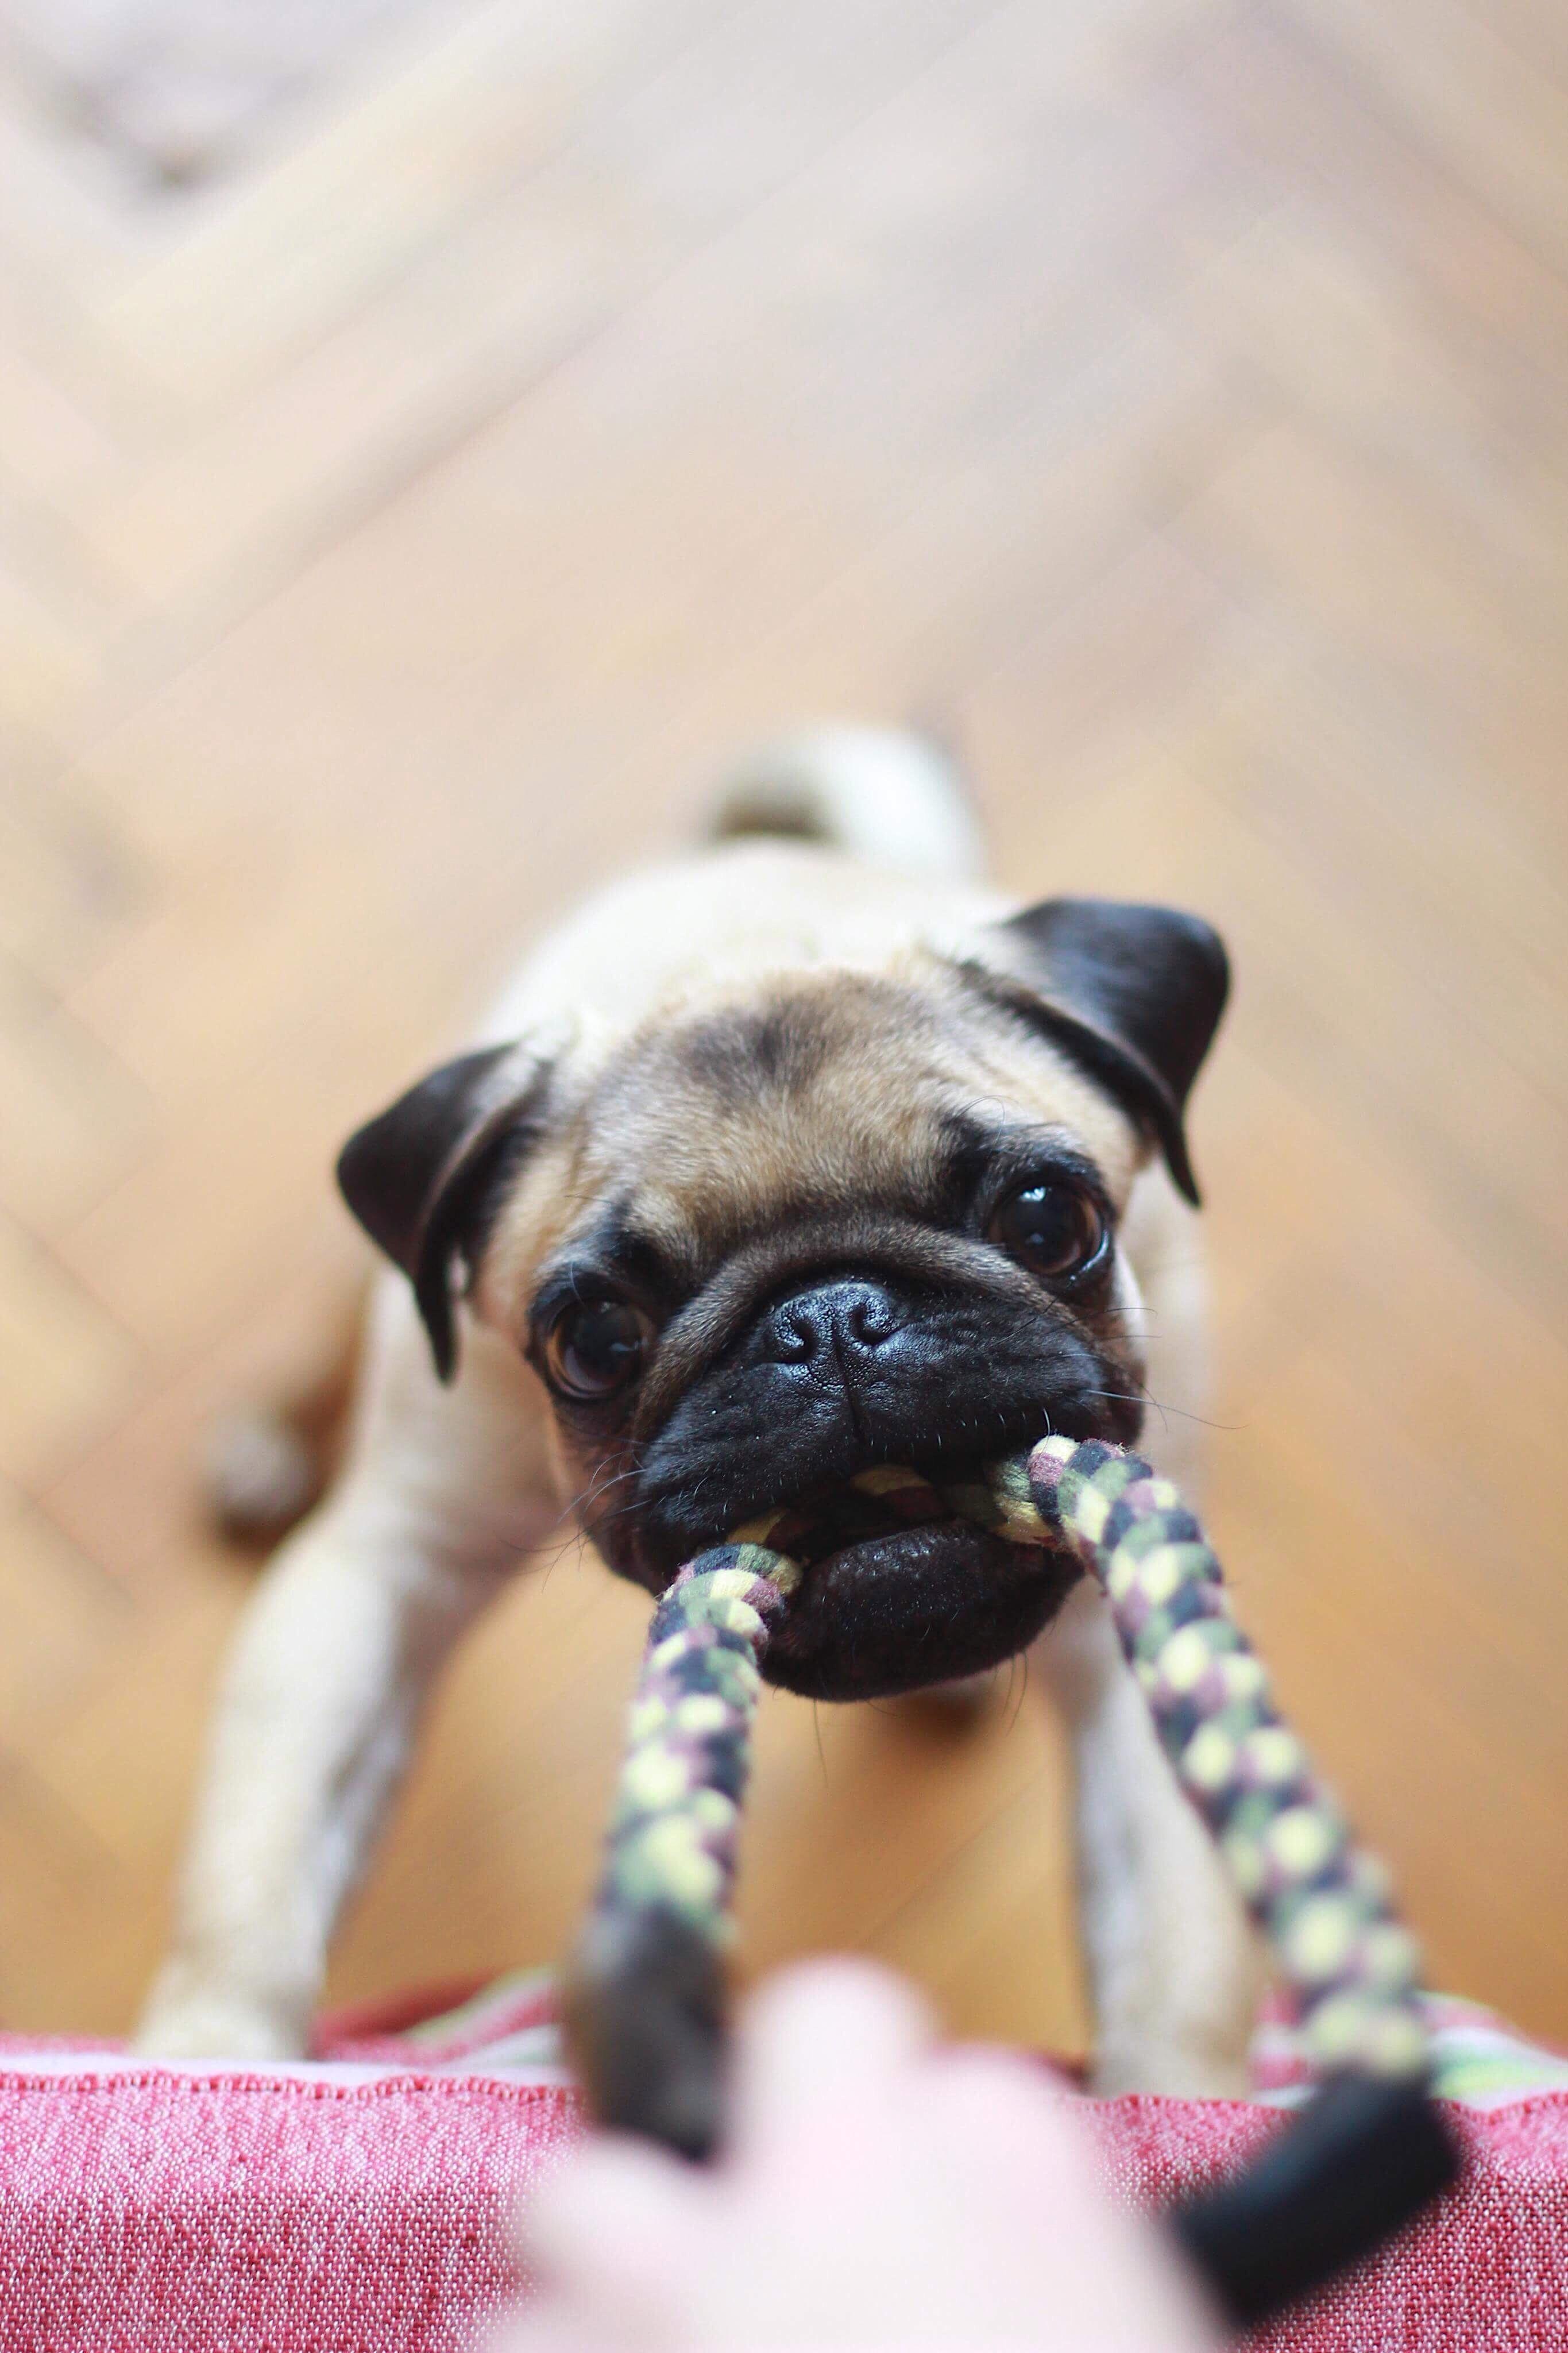 fawn pug biting rope